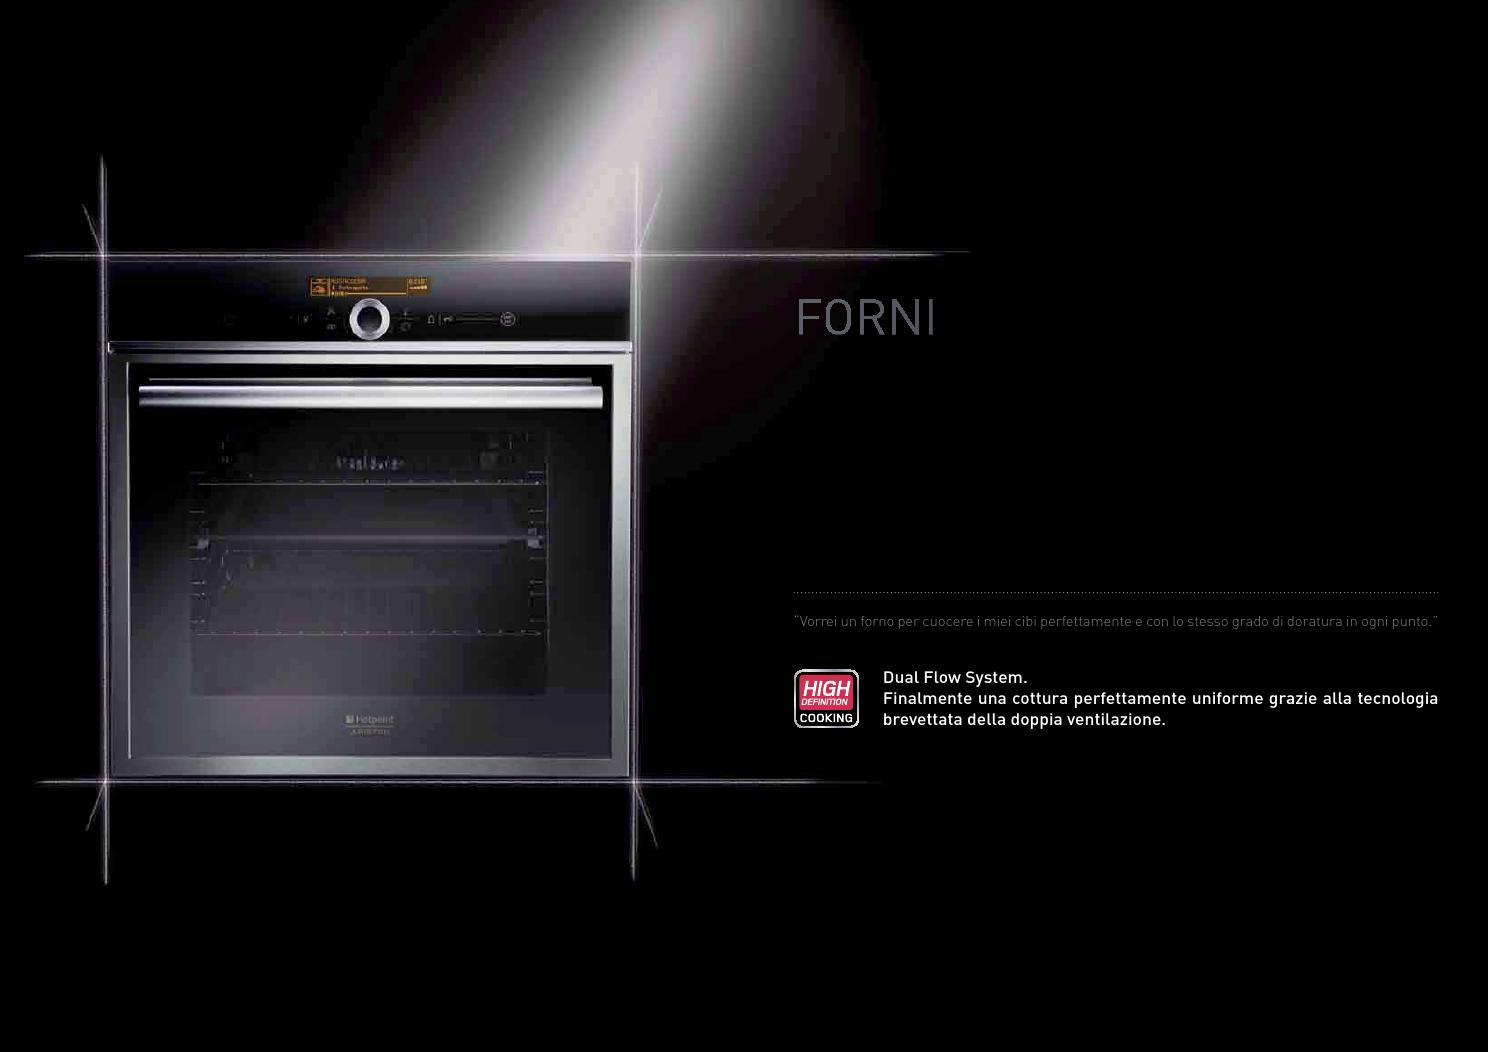 Forni ad incasso Hotpoint Ariston by ATA snc - issuu